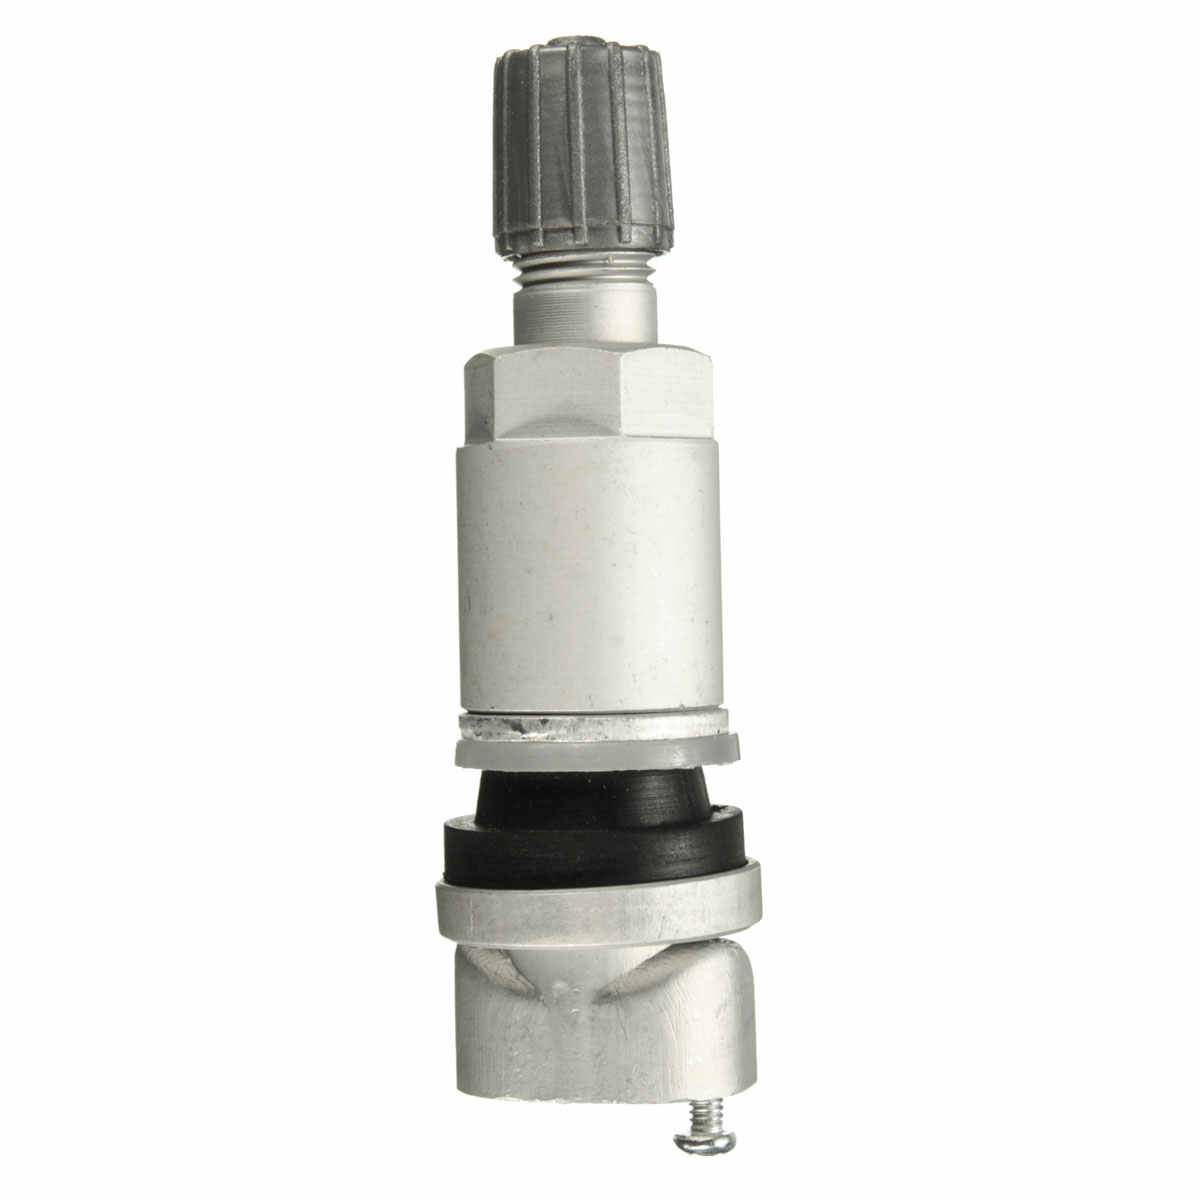 Car Tyre Pressure Sensor Valve For Peugeot 407 607 807 for Citroen C4 C5 C6  for Ford/Galaxy